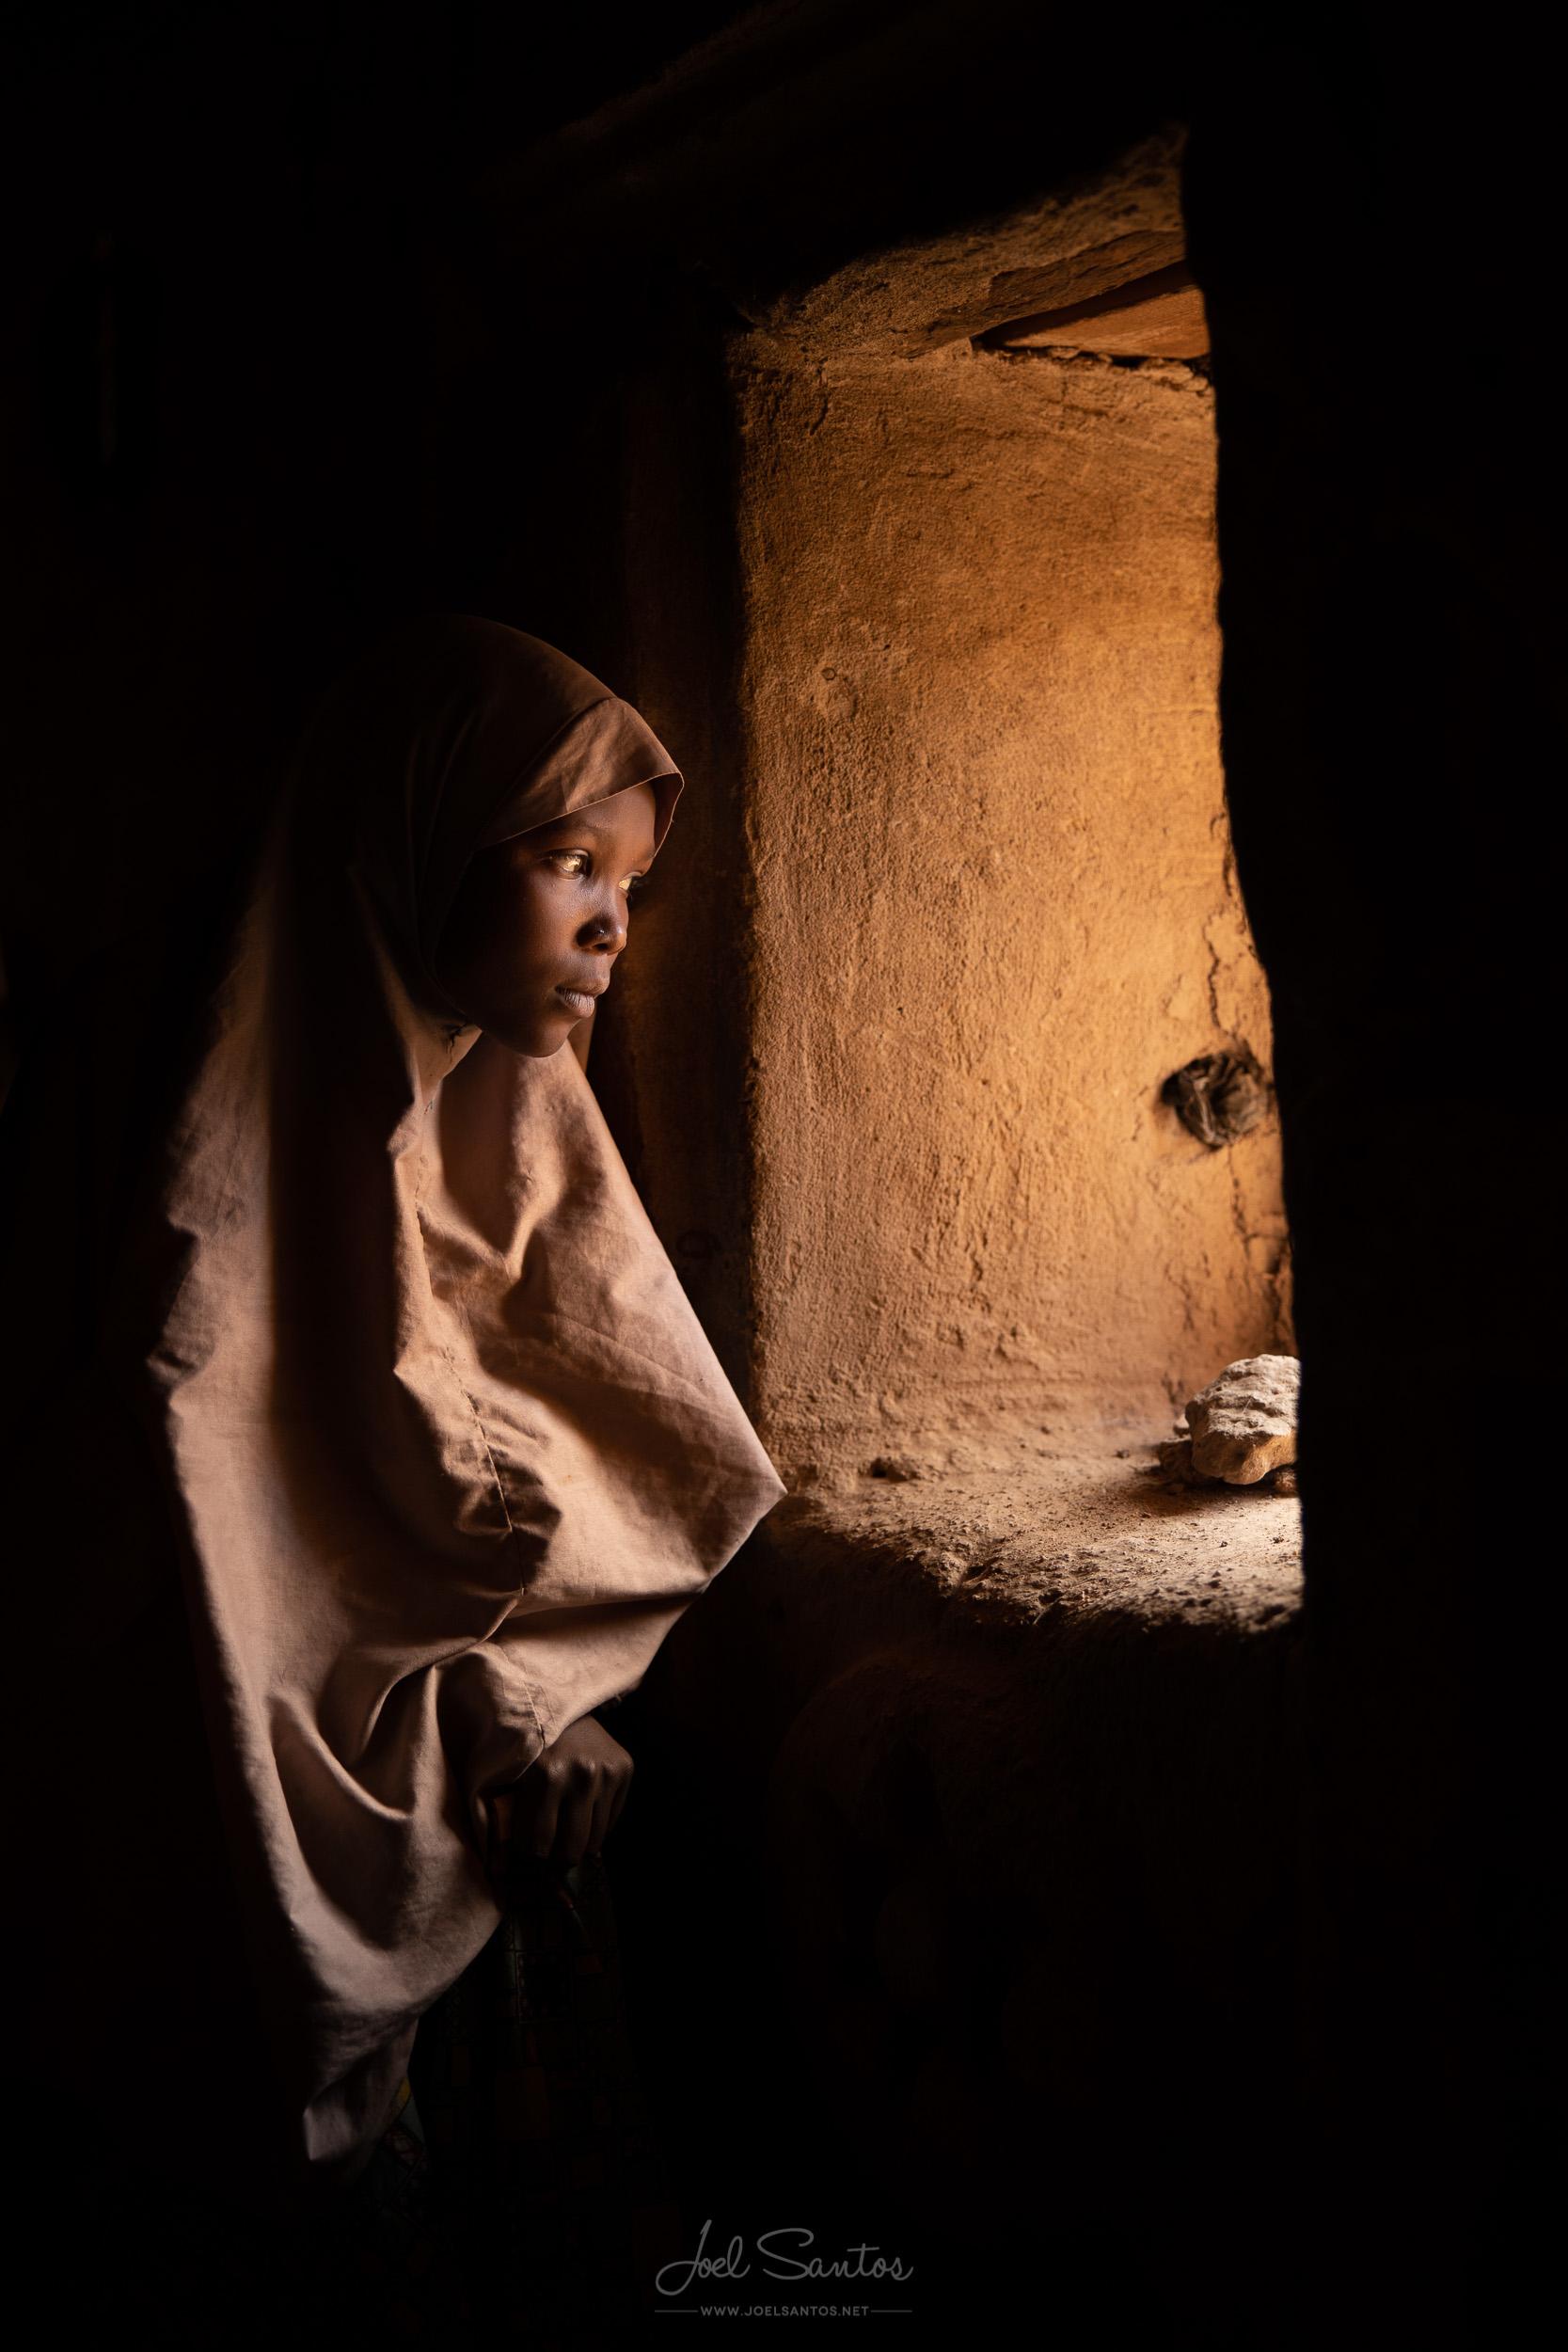 Hausa Girl, Agadez, Niger